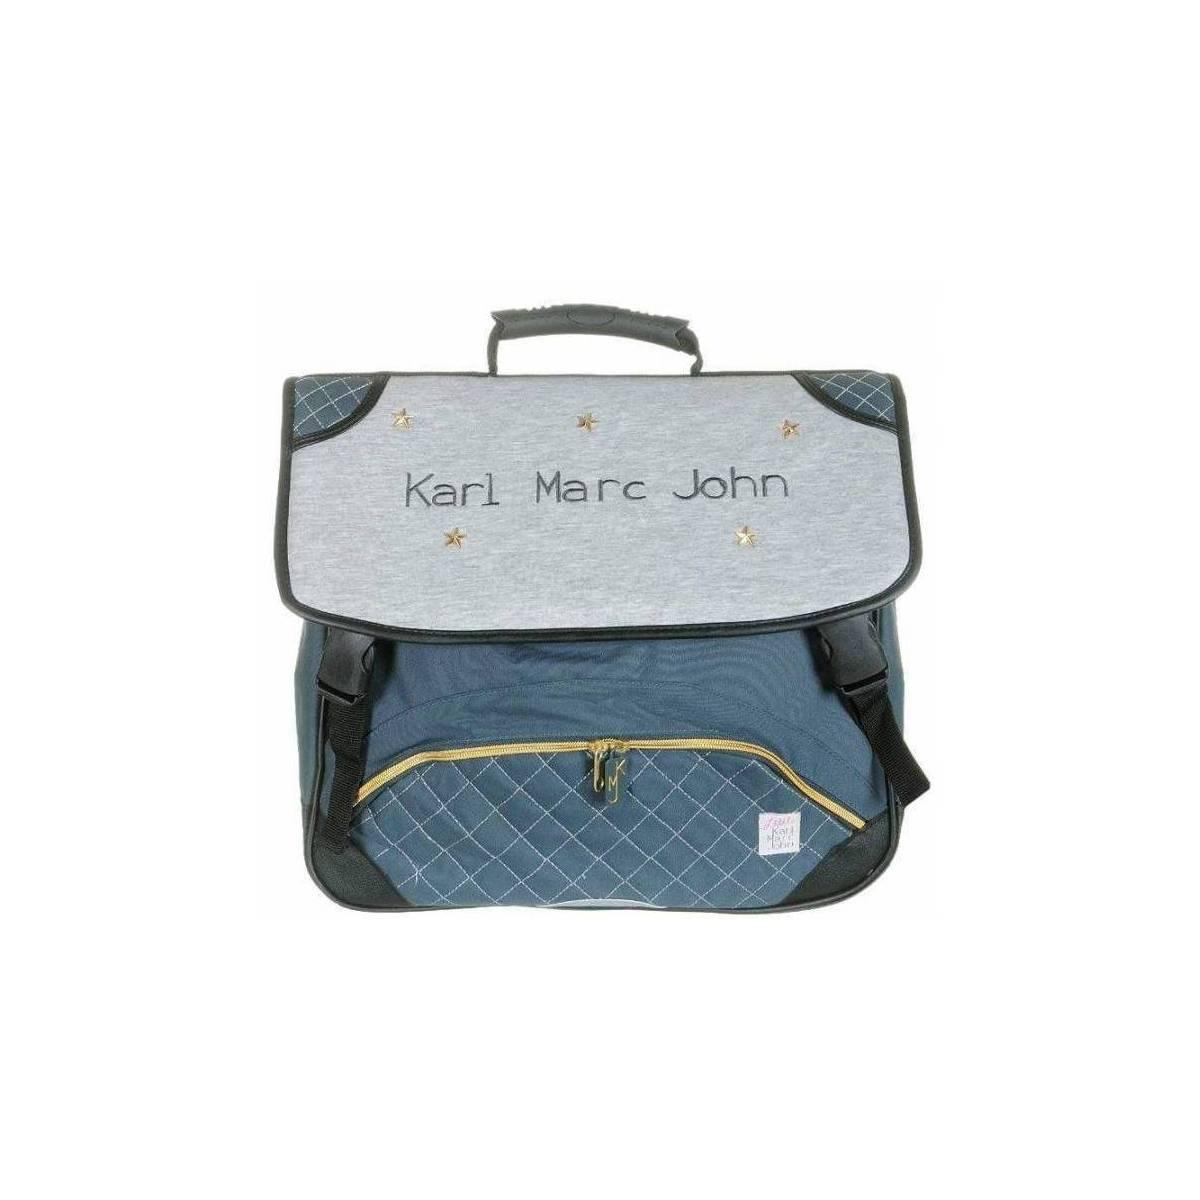 "Karl Marc John - Cartable ""Star"" - 41 cm - Gris"